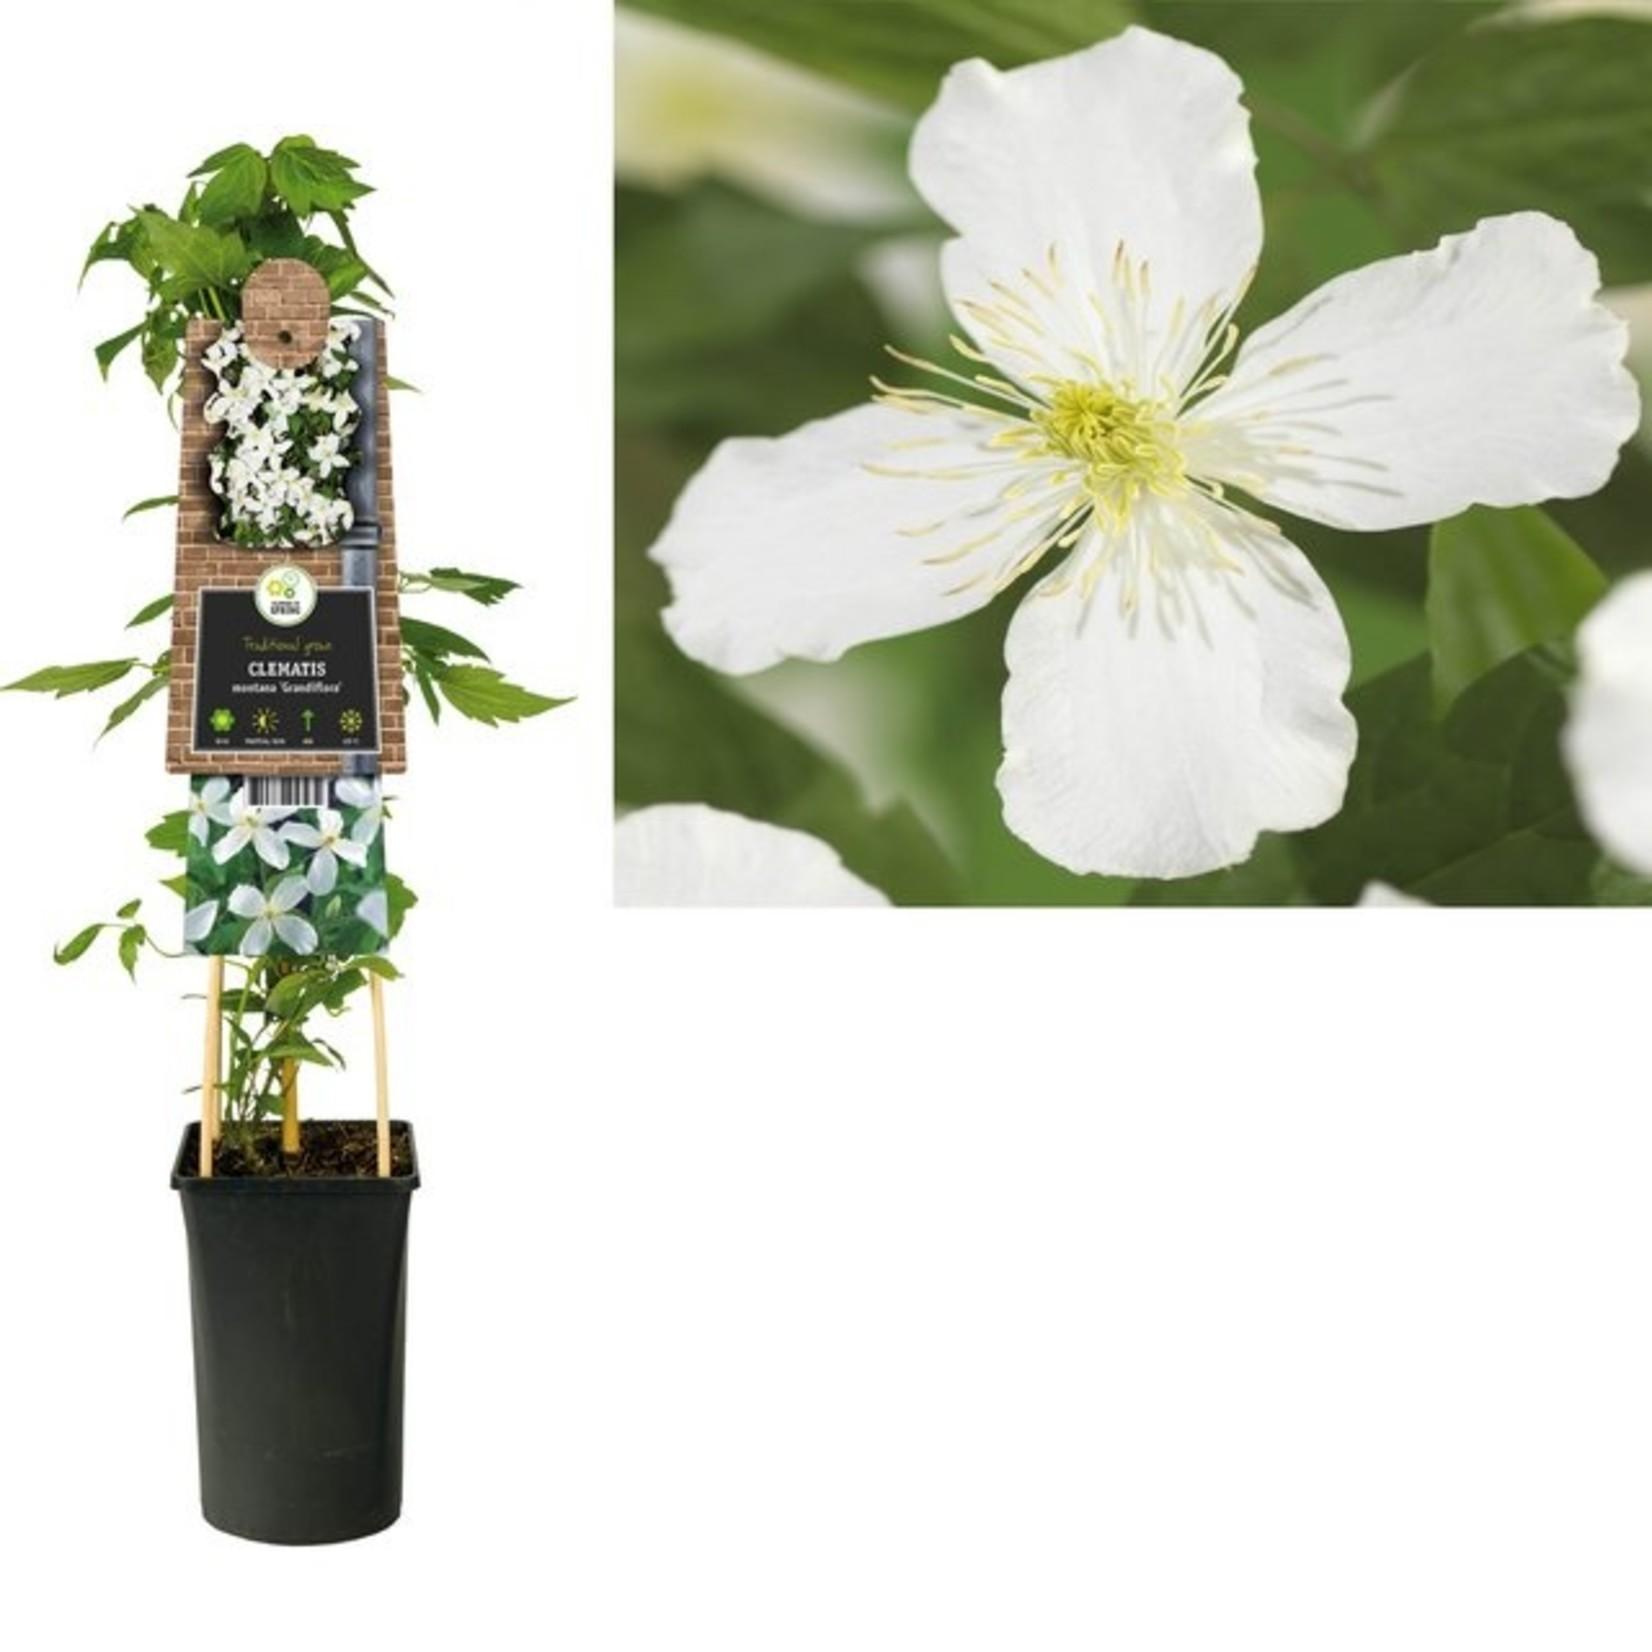 Clematis montana 'Grandiflora' (Bosrank)